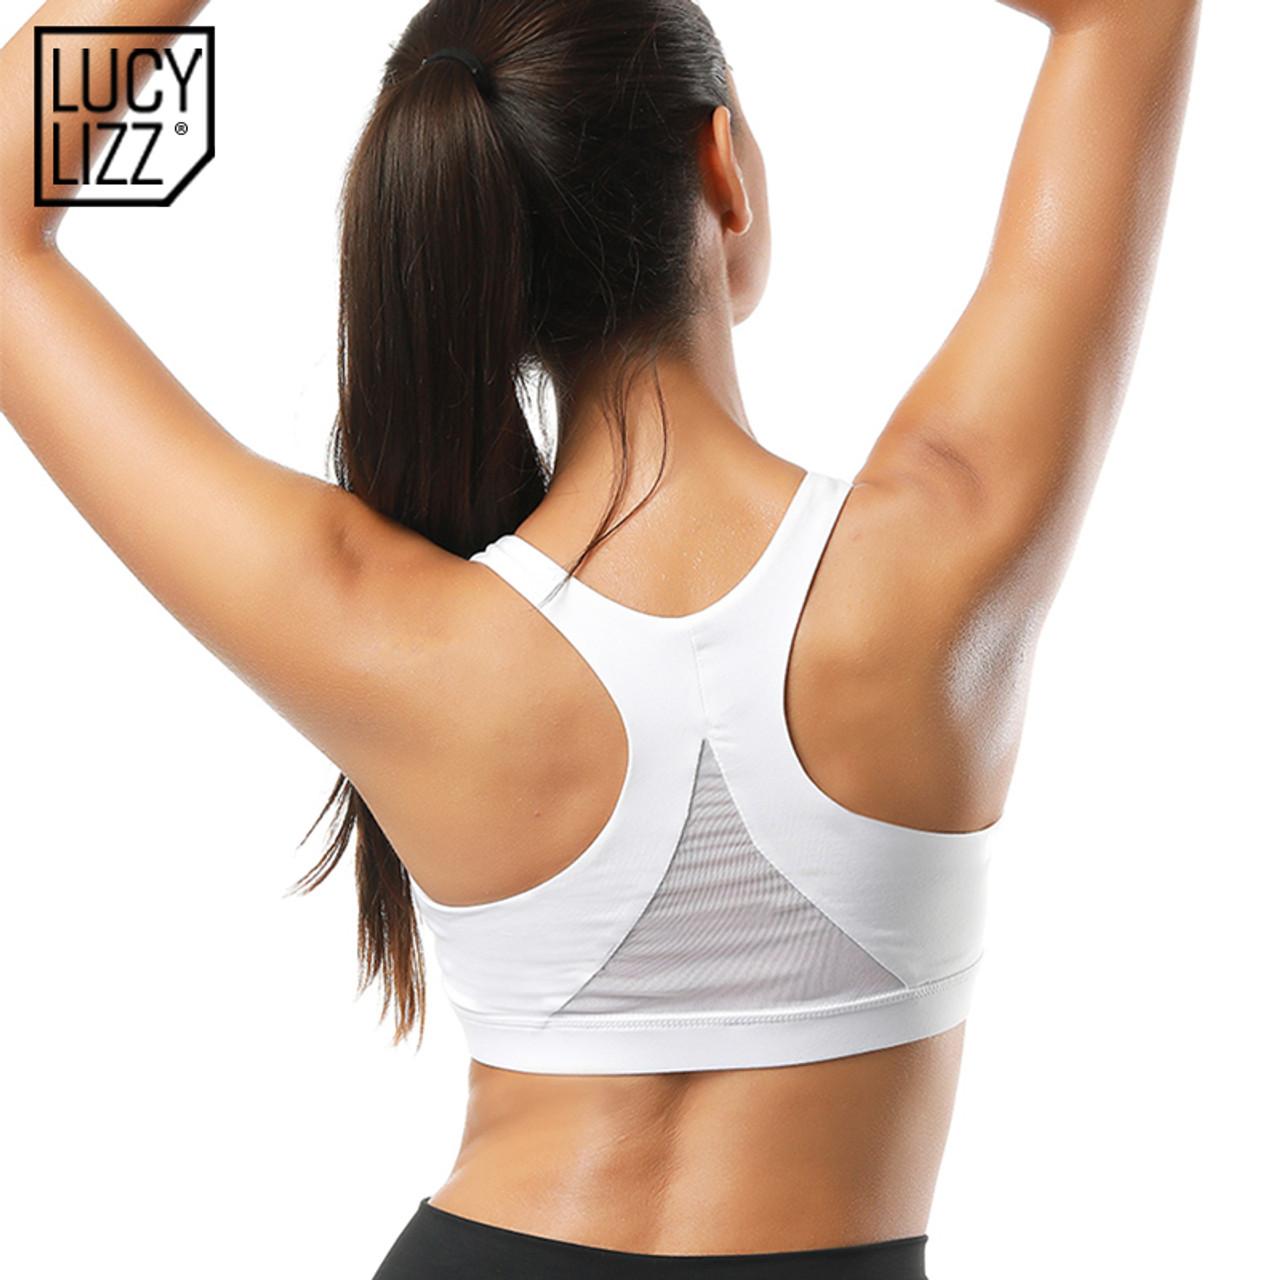 d3c0191c914 Lucylizz Back Mesh Triangle Push Up Sports Bra Top Fitness Racerback Bras  Women Gym Sport Top ...